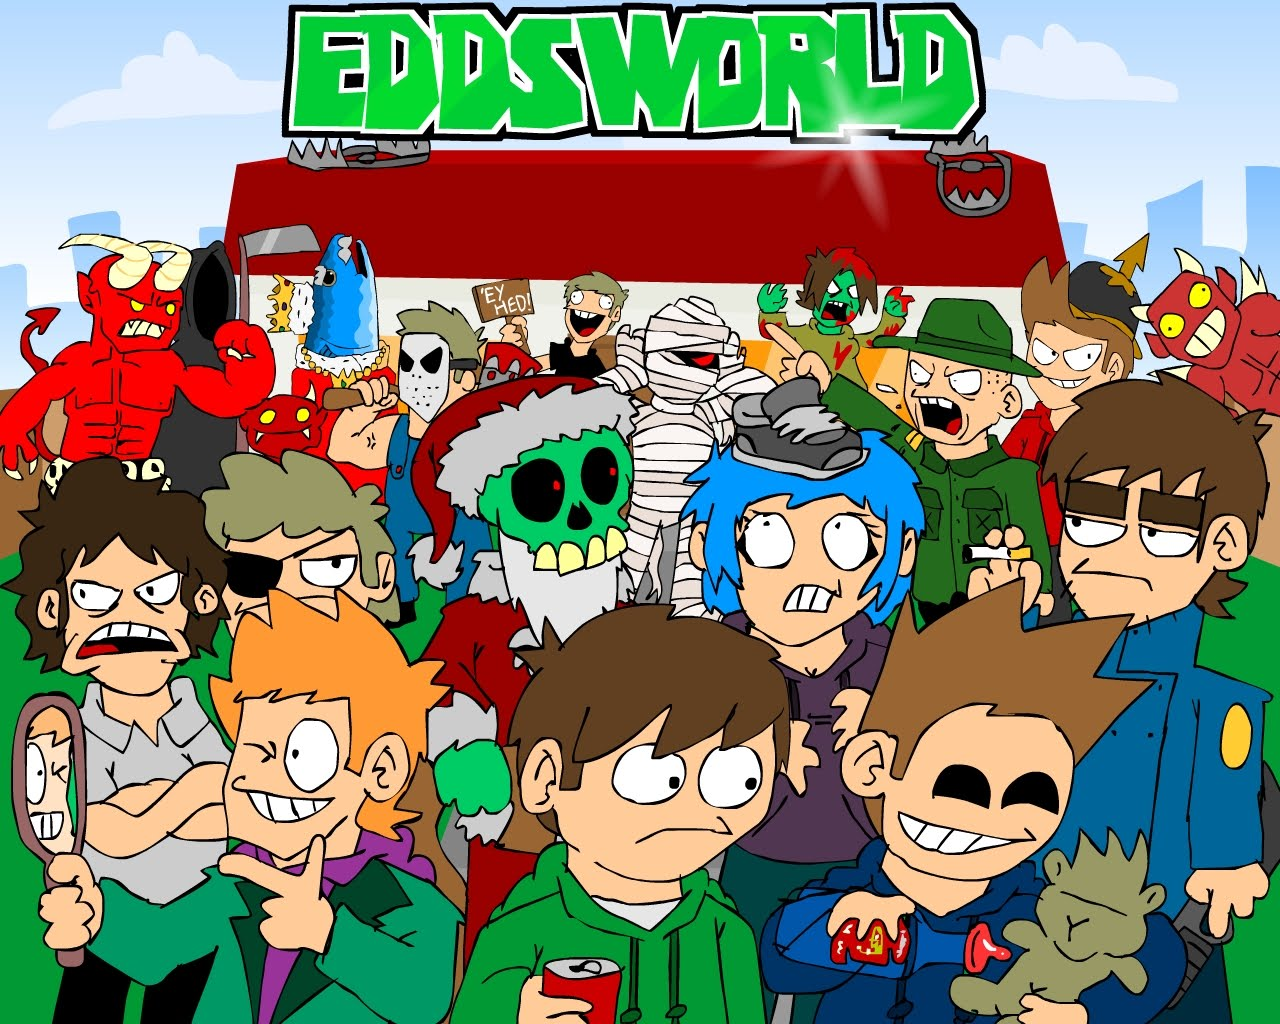 http://2.bp.blogspot.com/_1AahBY9IEXU/TDN6HEKcxxI/AAAAAAAAAF8/L7QqmCdMds8/s1600/Mega_wallpaper_3000_by_eddsworld.jpg